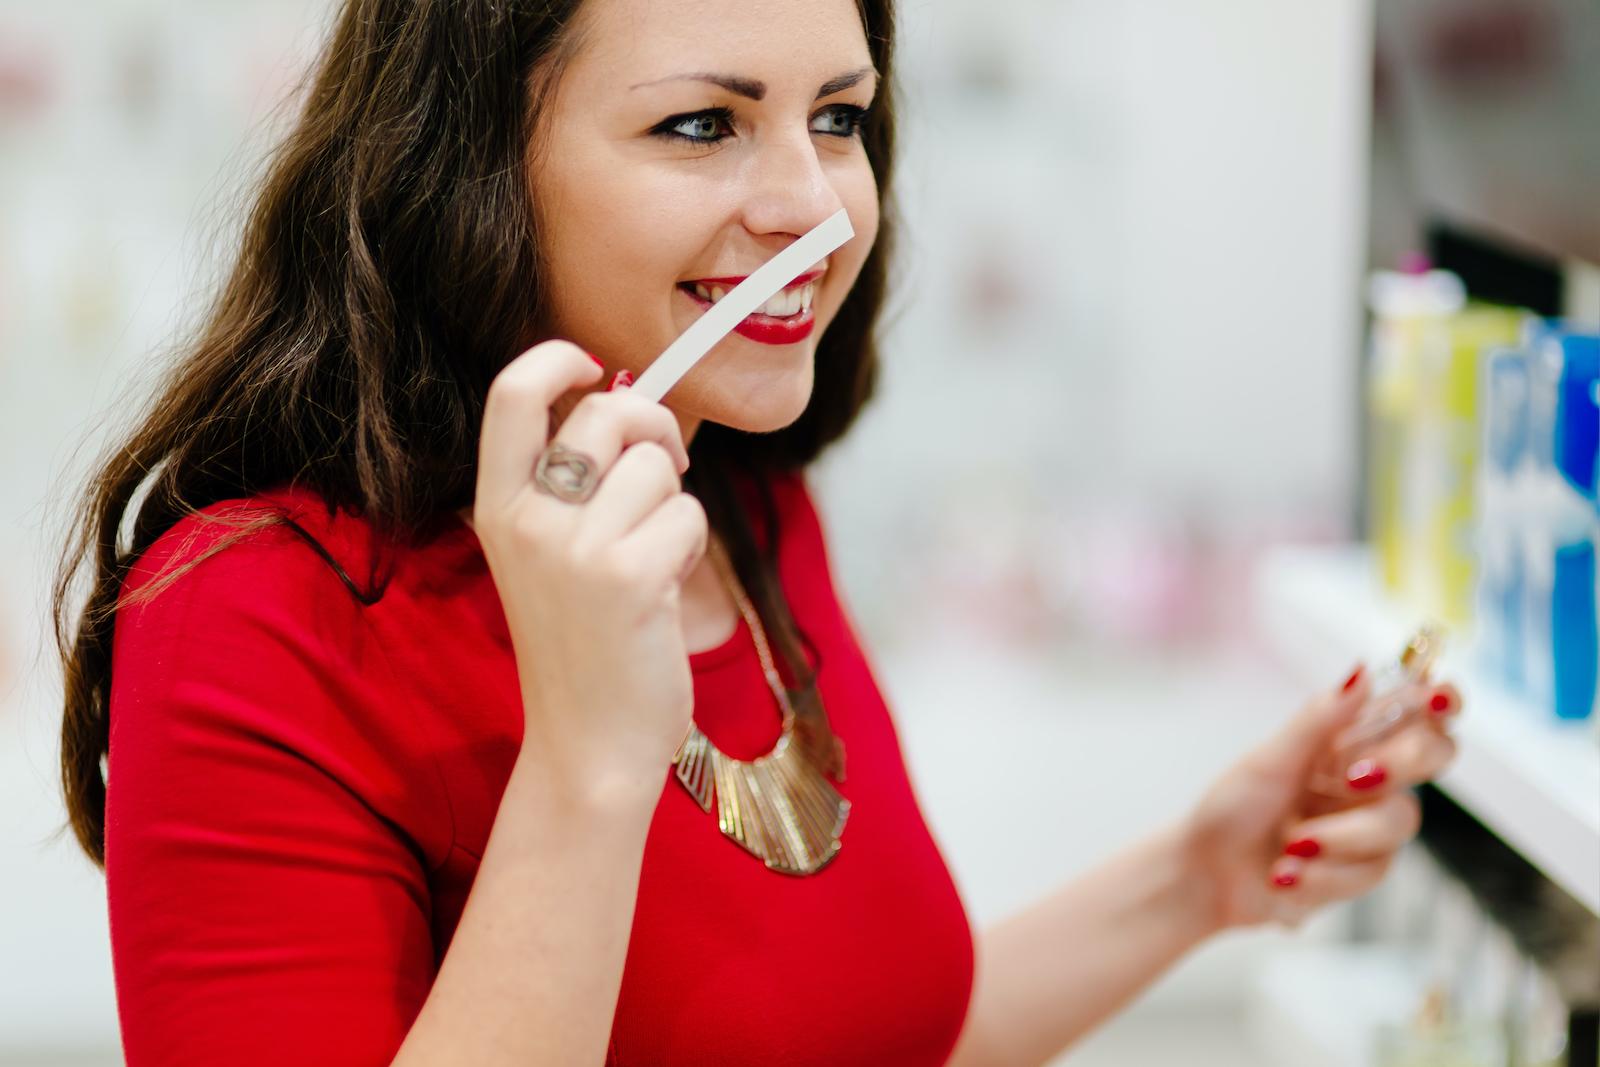 Happy woman testing new fragrances